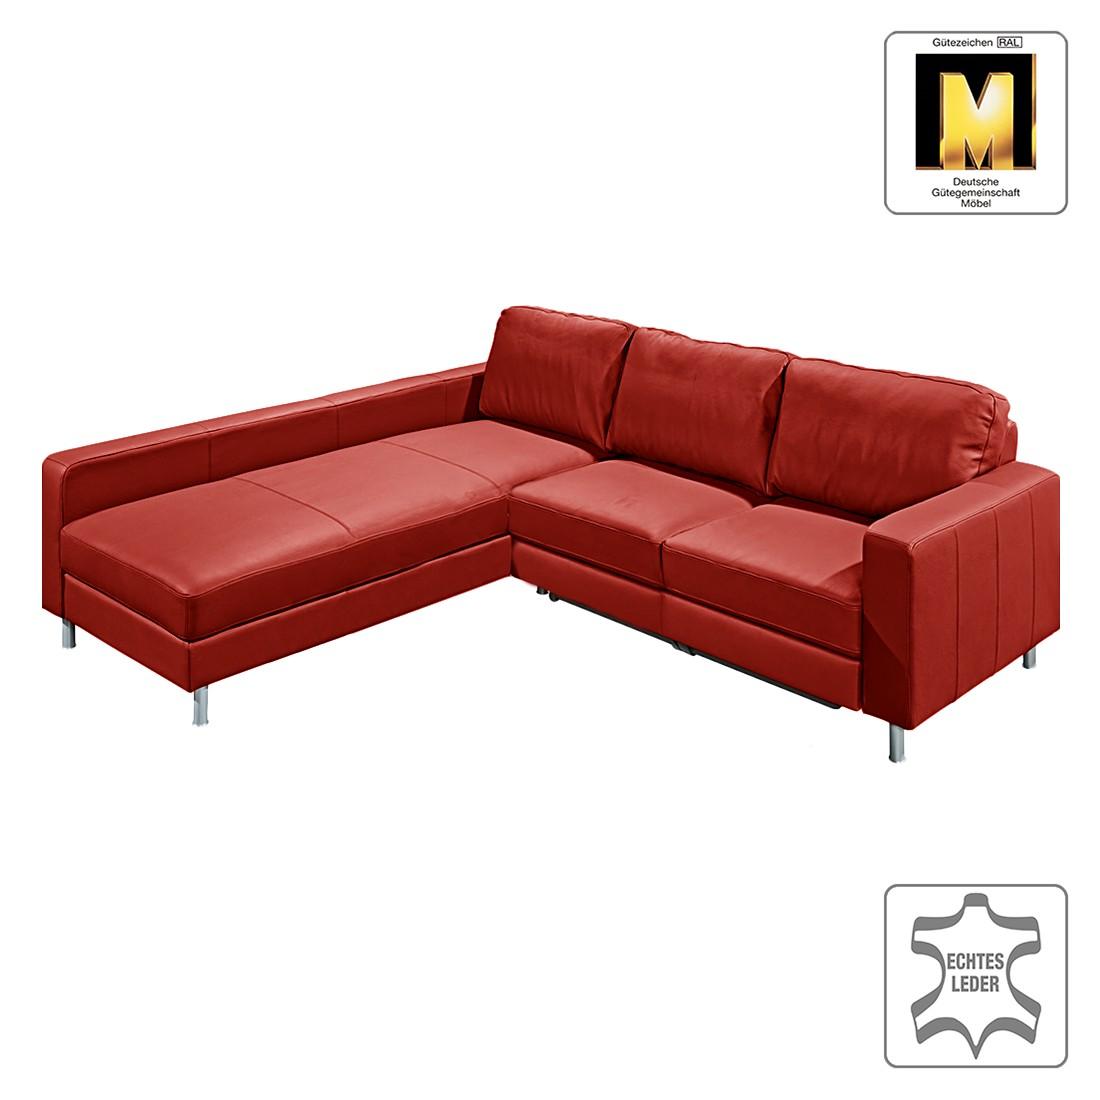 ecksofa casual line vi mit schlaffunktion echtleder rot ottomane davorstehend links claas. Black Bedroom Furniture Sets. Home Design Ideas